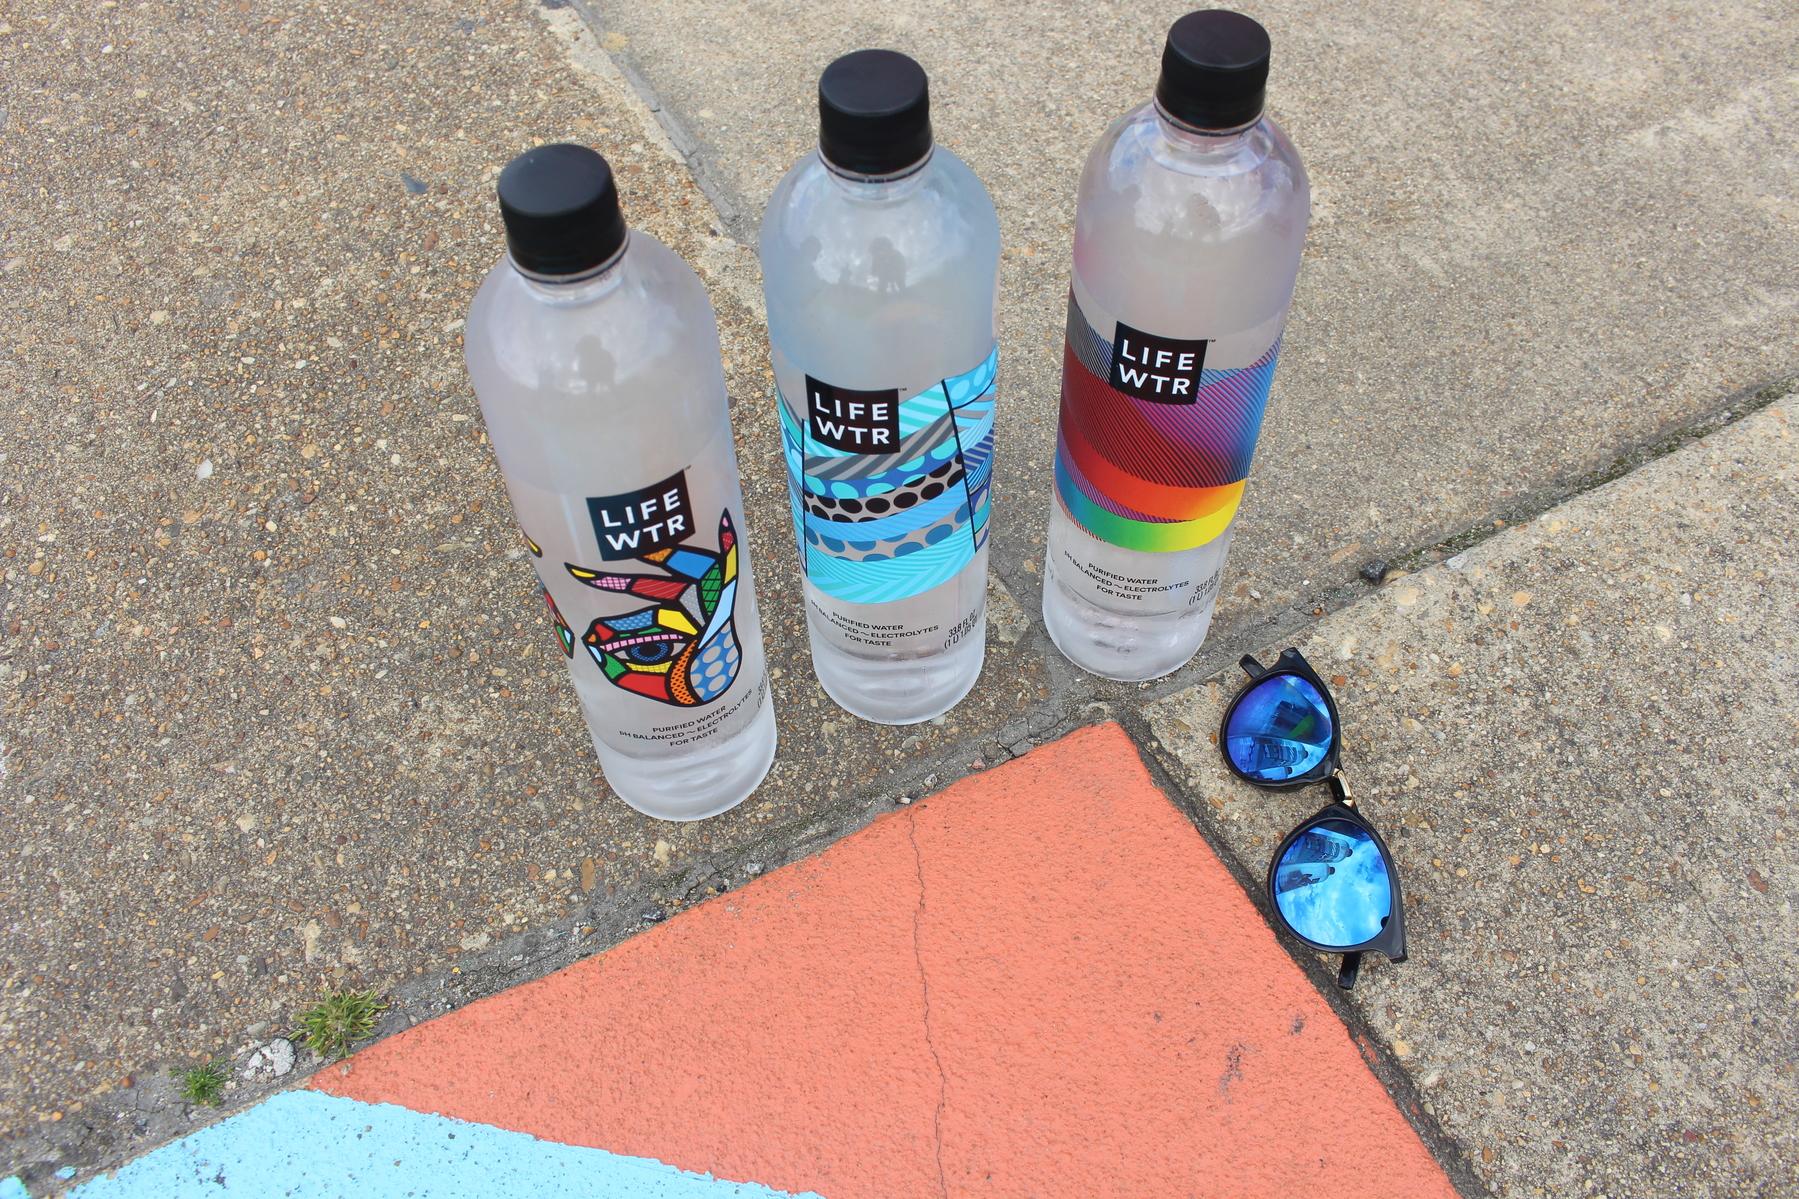 LIFEWTR bottles and sunglasses